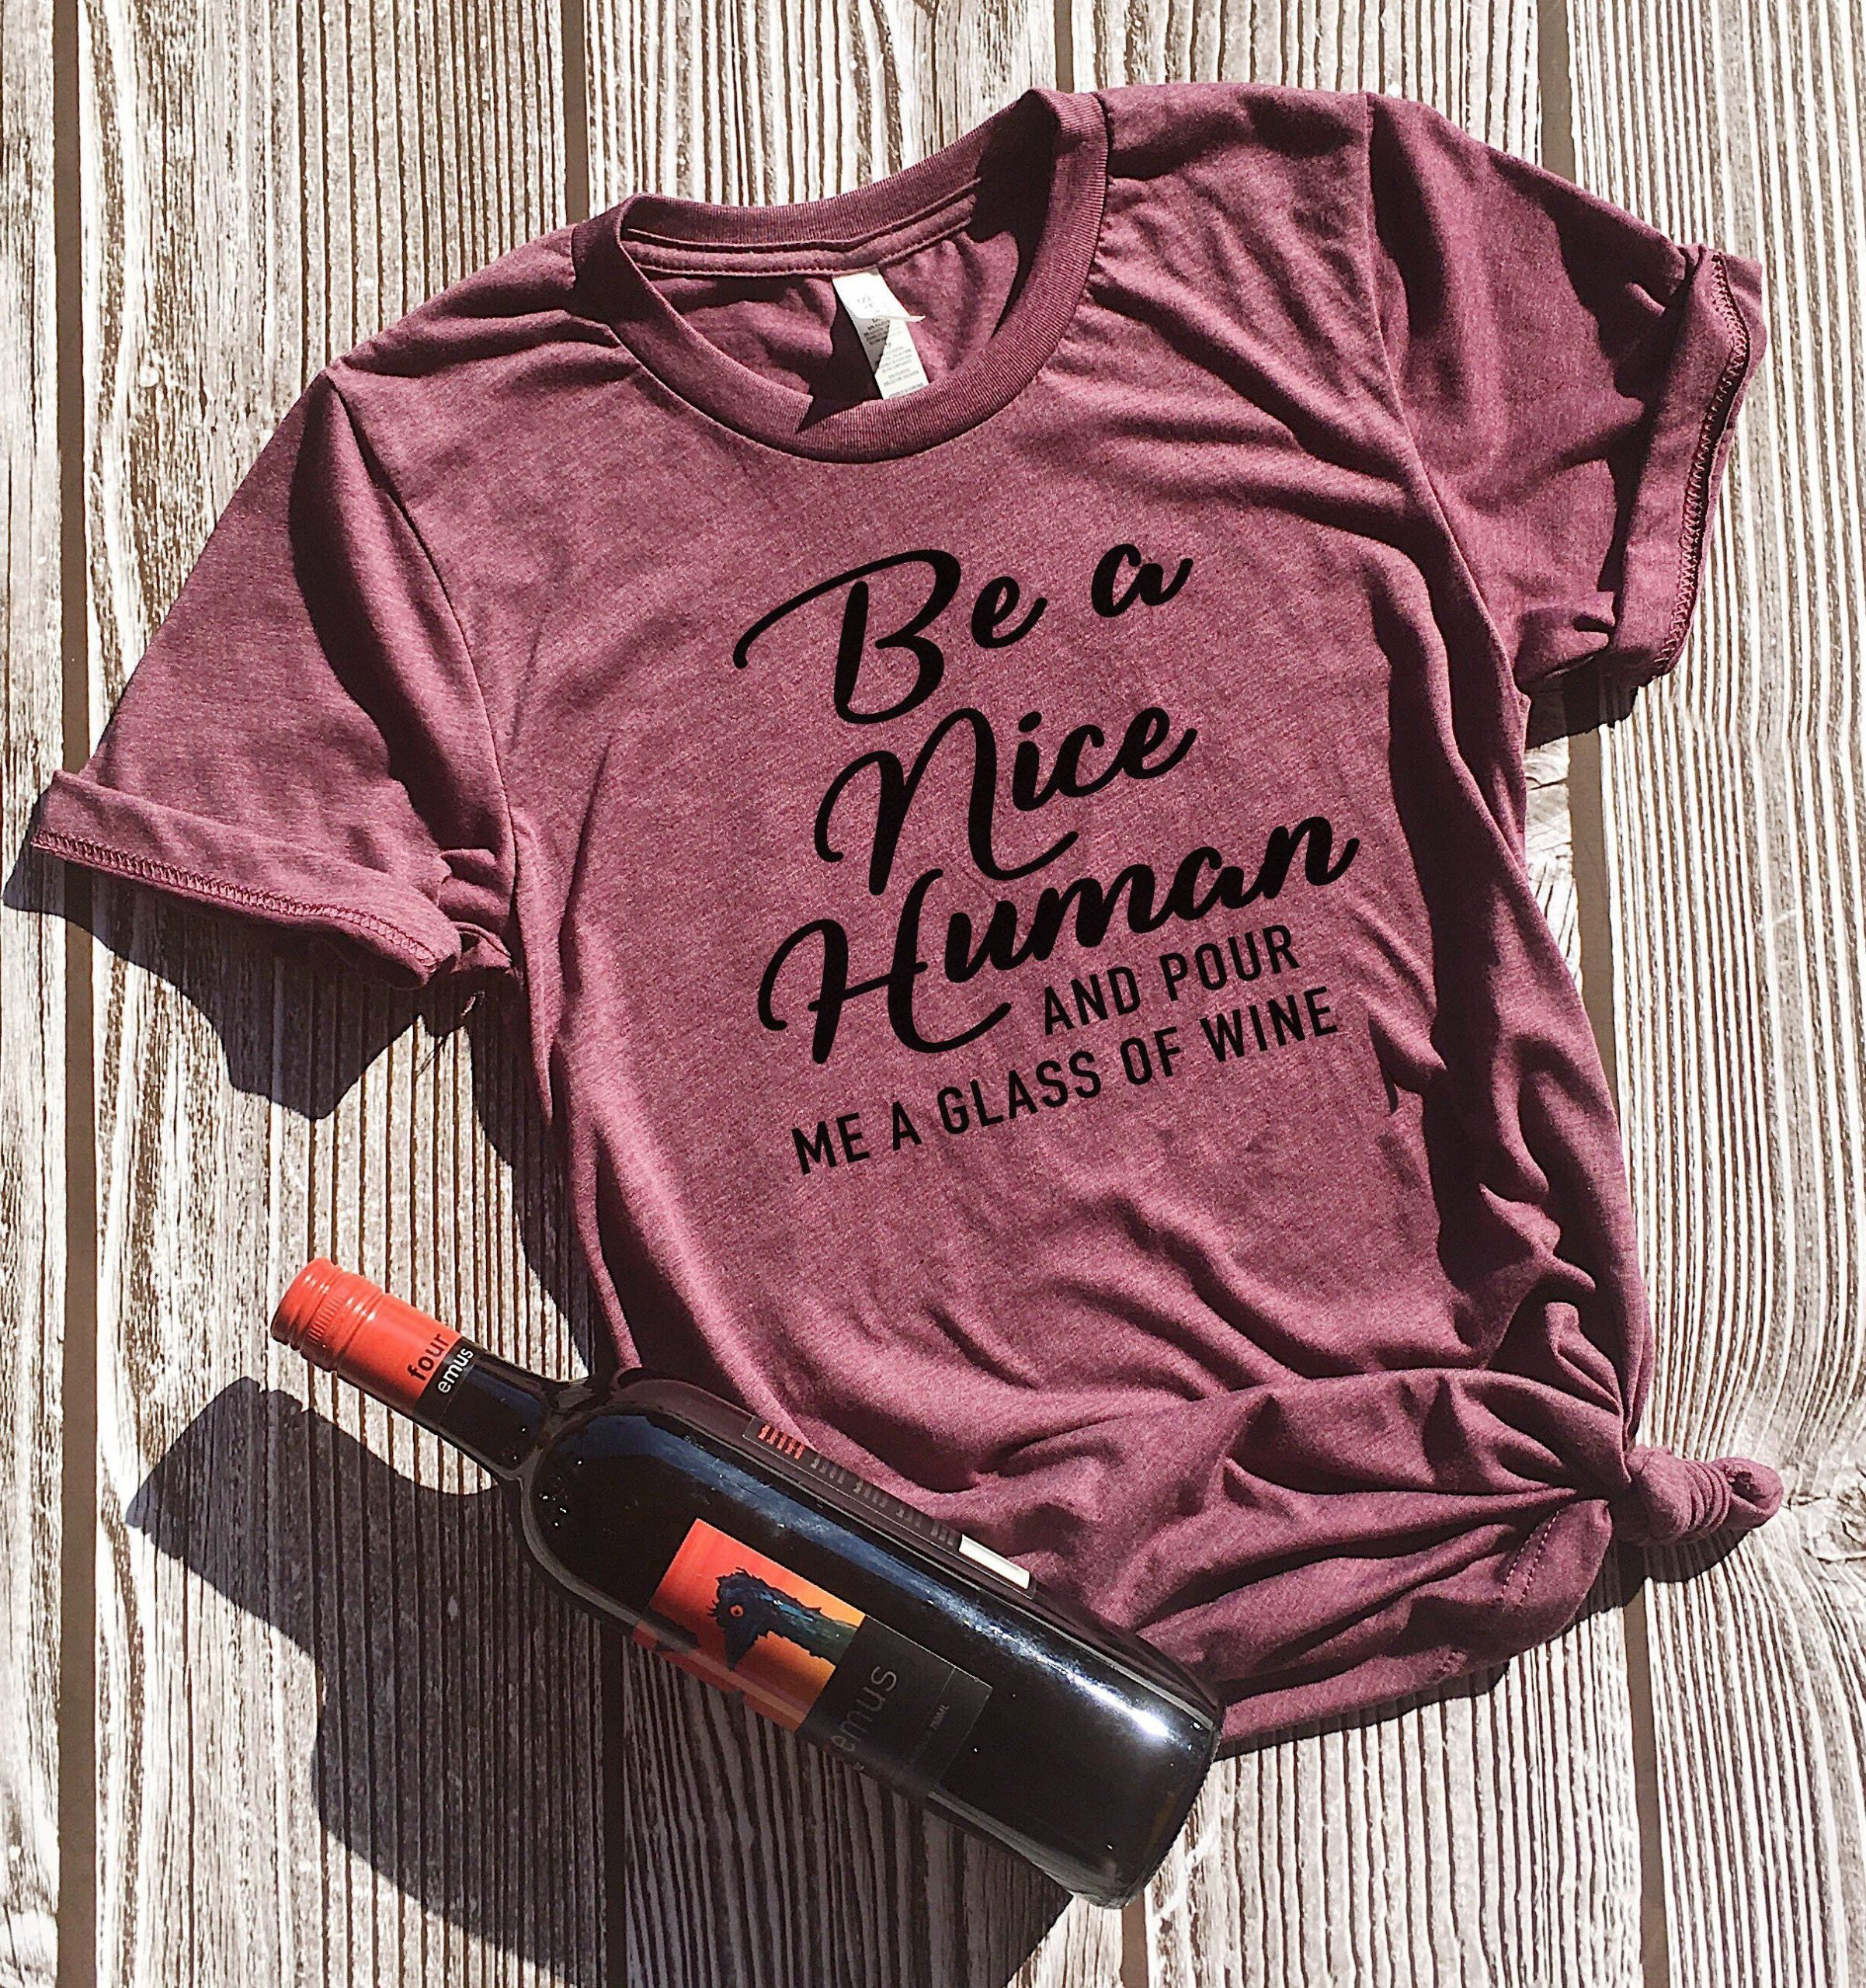 Park Art|My WordPress Blog_Be A Nice Human Shirt Walmart